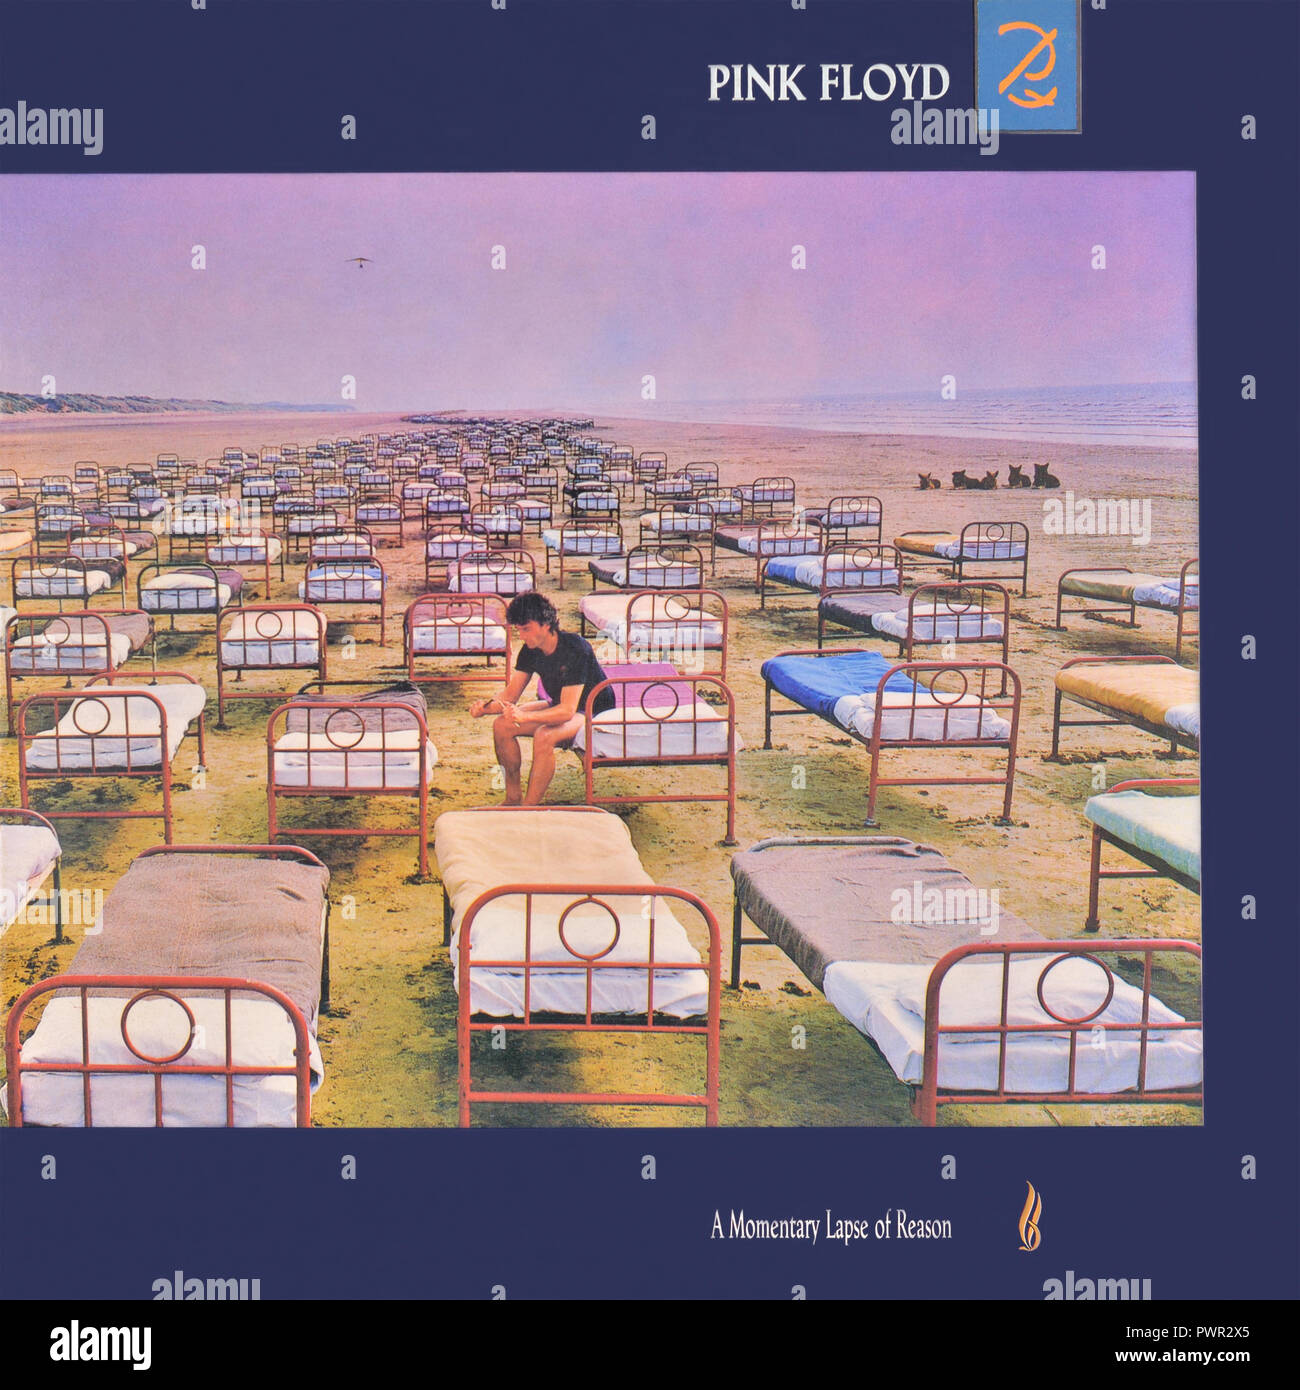 50d059d65 Pink Floyd original vinyl album cover - A Momentary Lapse of Reason - 1987